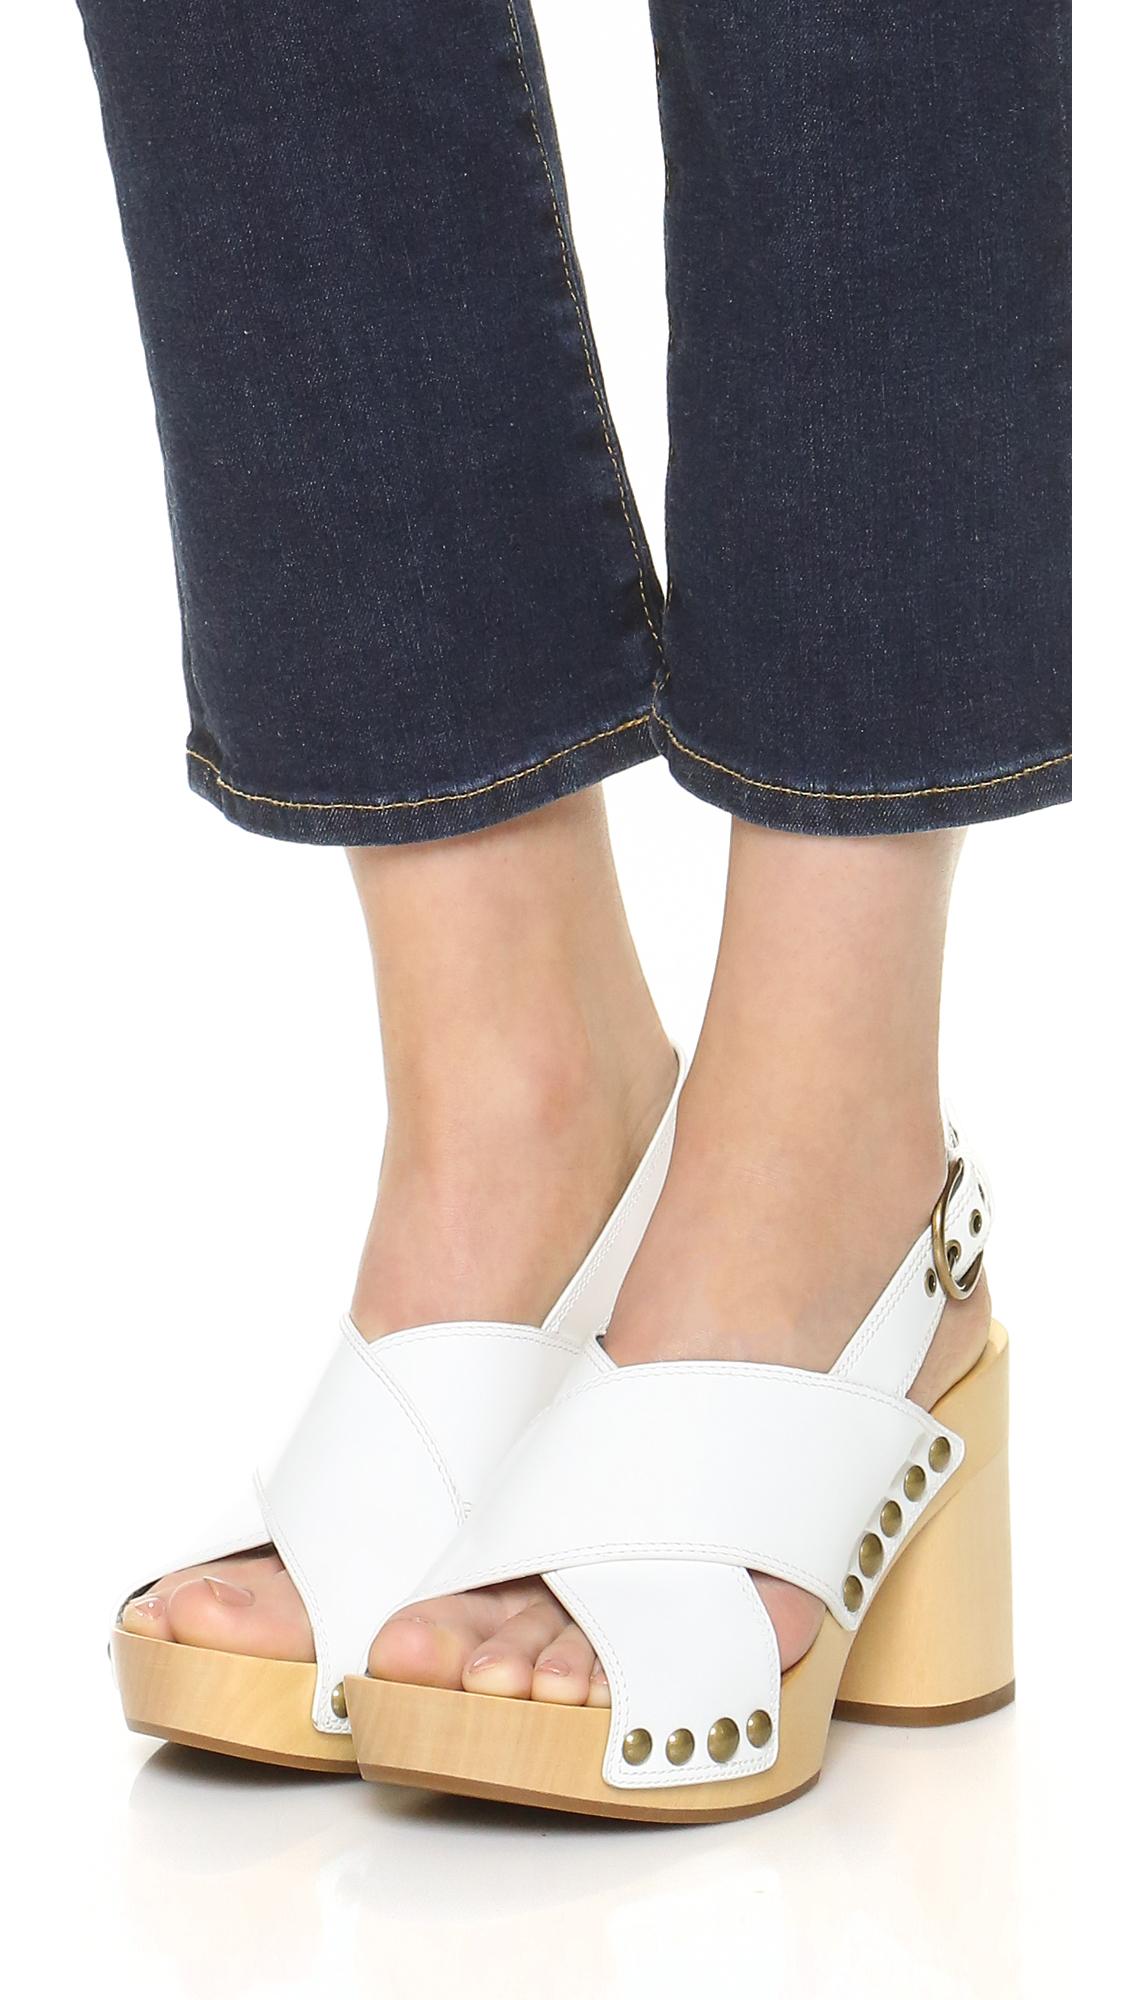 905bff9d877c Lyst - Marc Jacobs Linda Crisscross Sandal Clogs in White